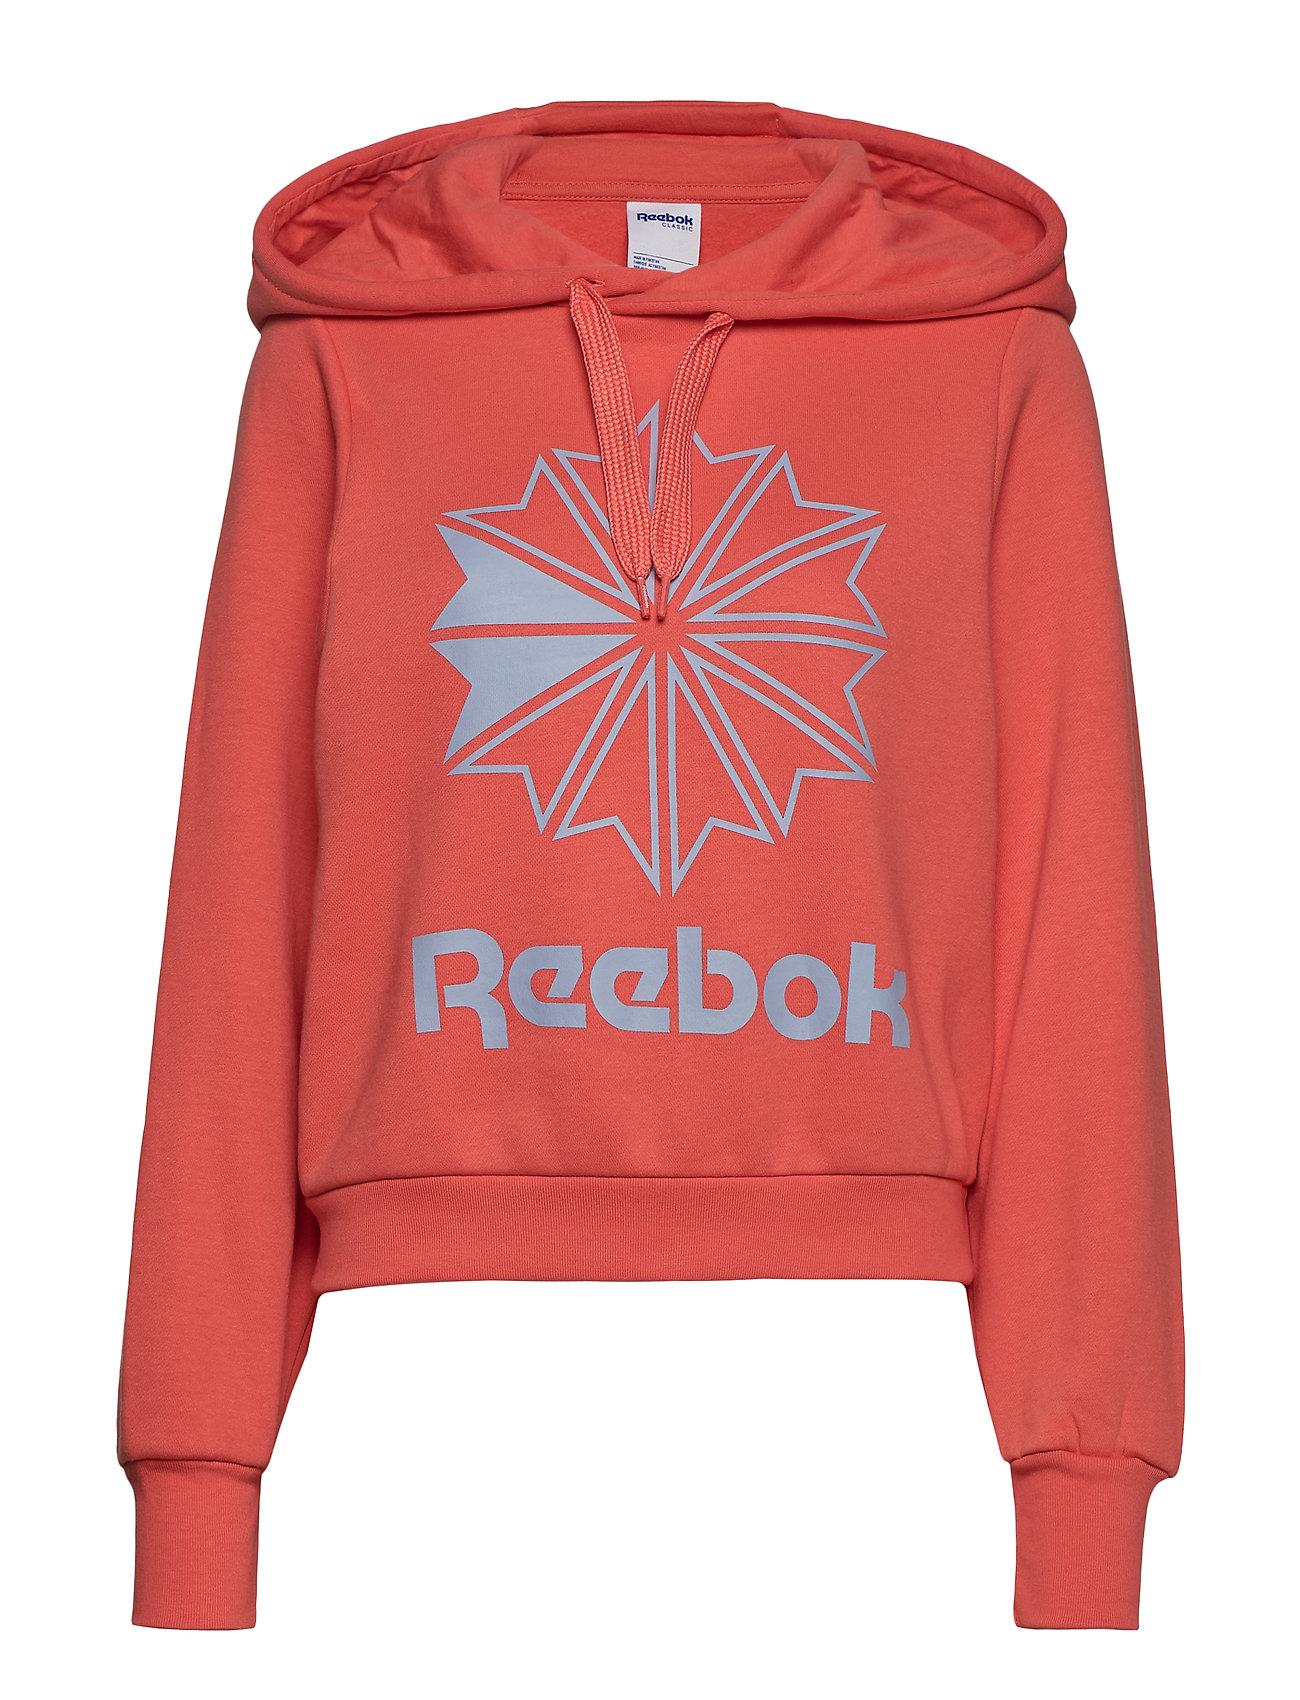 Reebok Classics CL FL BIG LOGO HOODIE - ROSETT